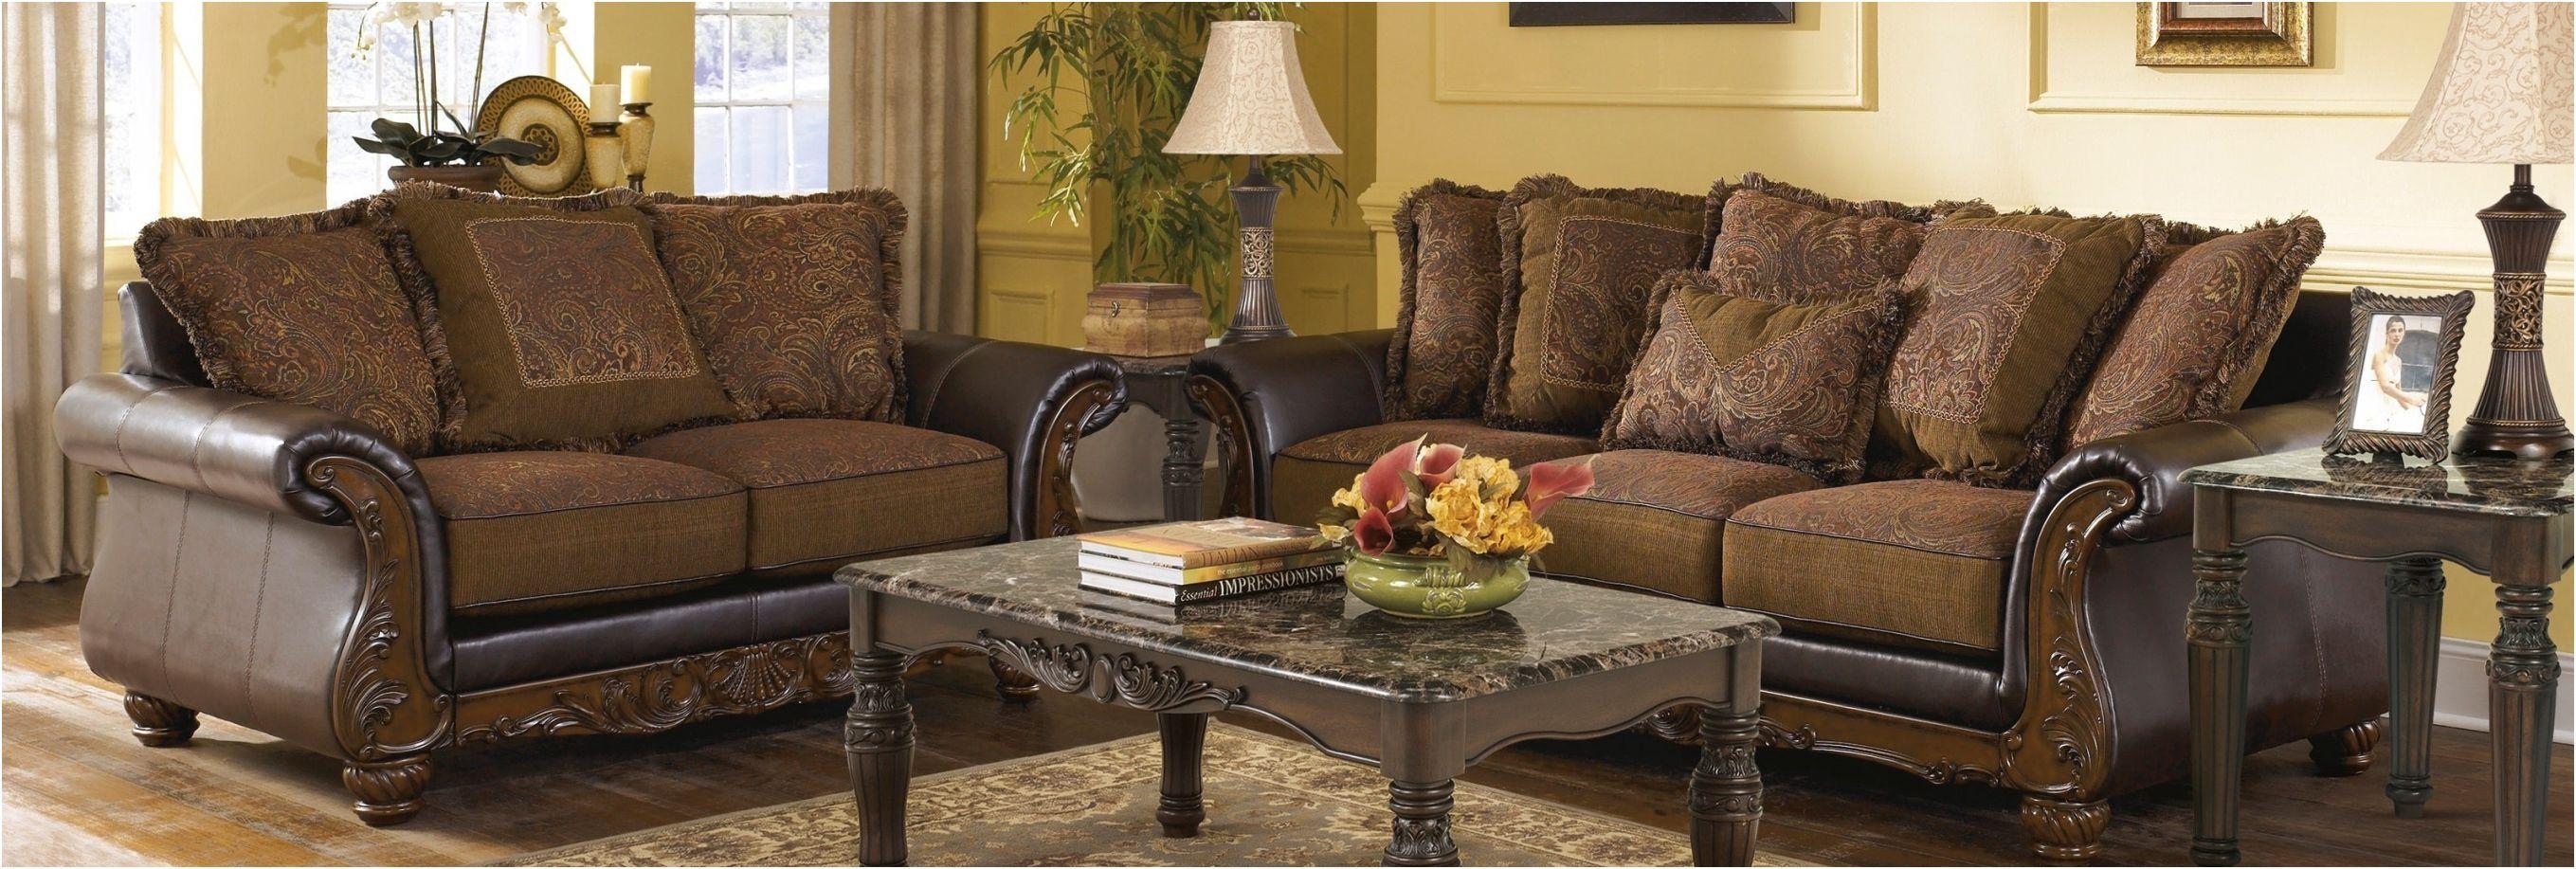 77 Prestigious Rent A Center Living Room Furniture Images